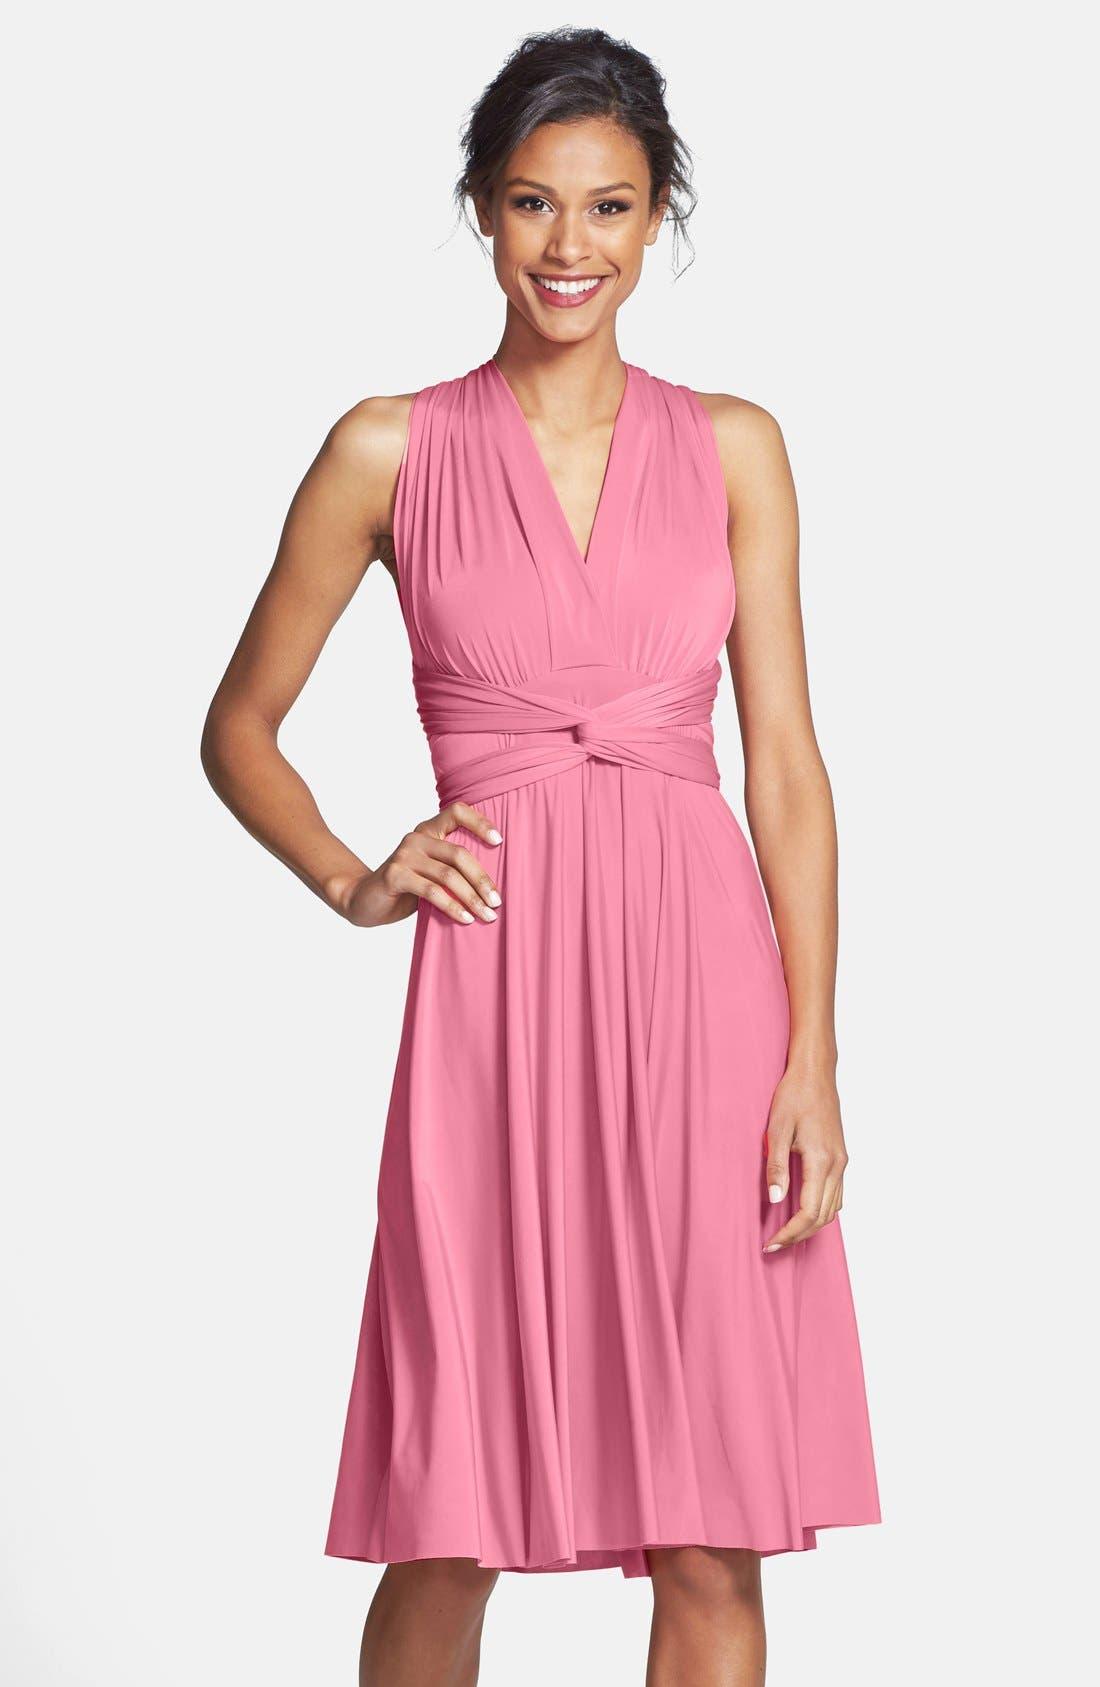 Dessy Collection Convertible Wrap Tie Surplice Jersey Dress